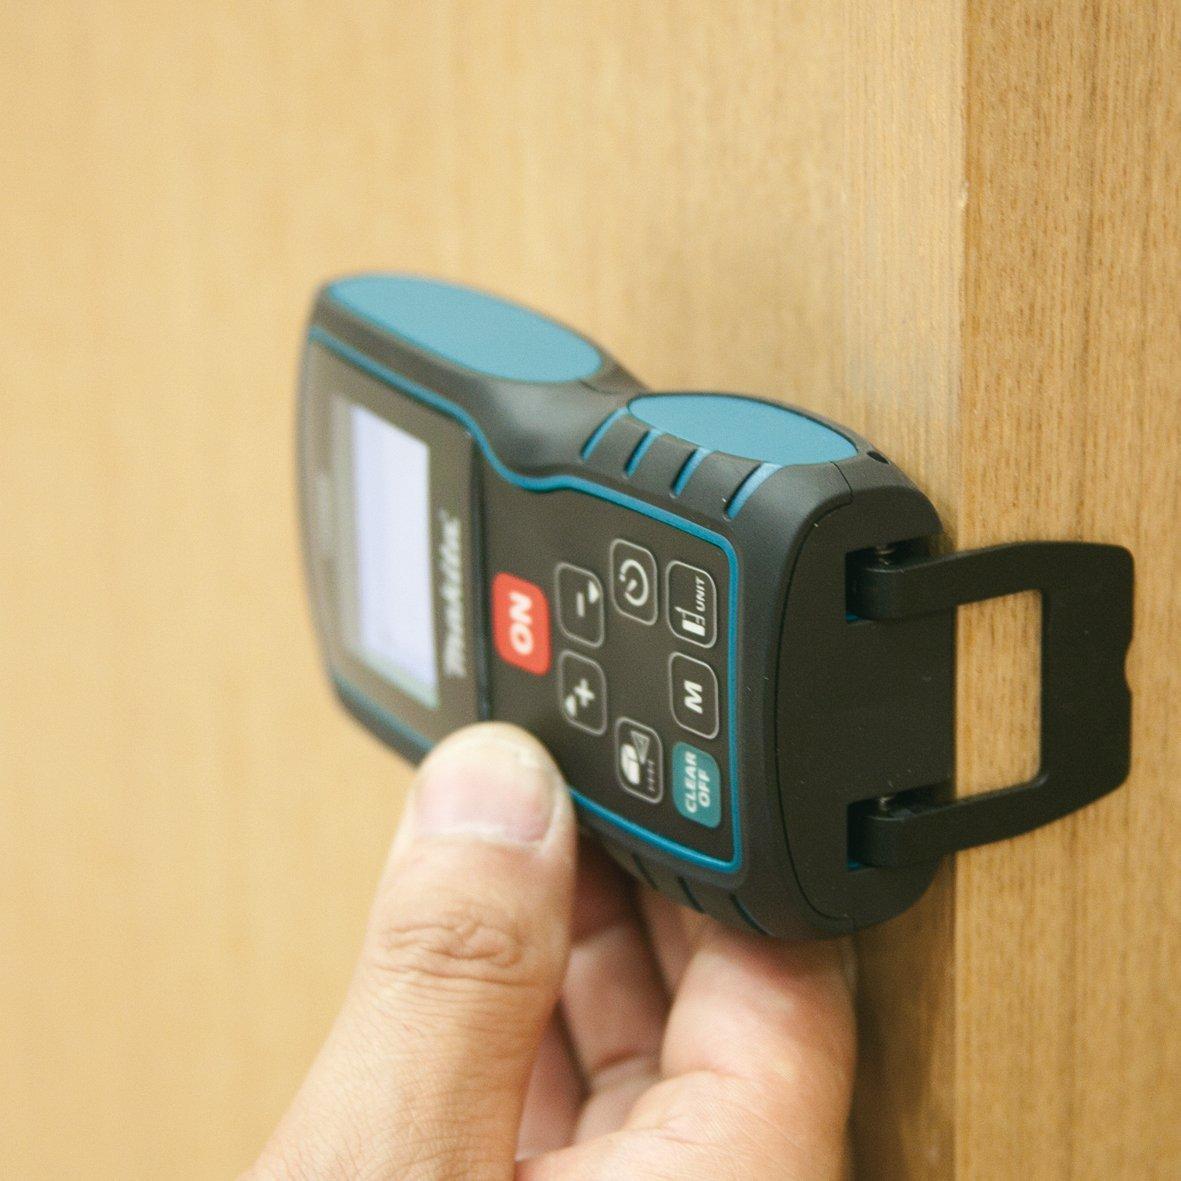 gesch/ützt /± 1.5 mm Distanzmessger/ät IP54 Makita LD080P  Professioneller Laser